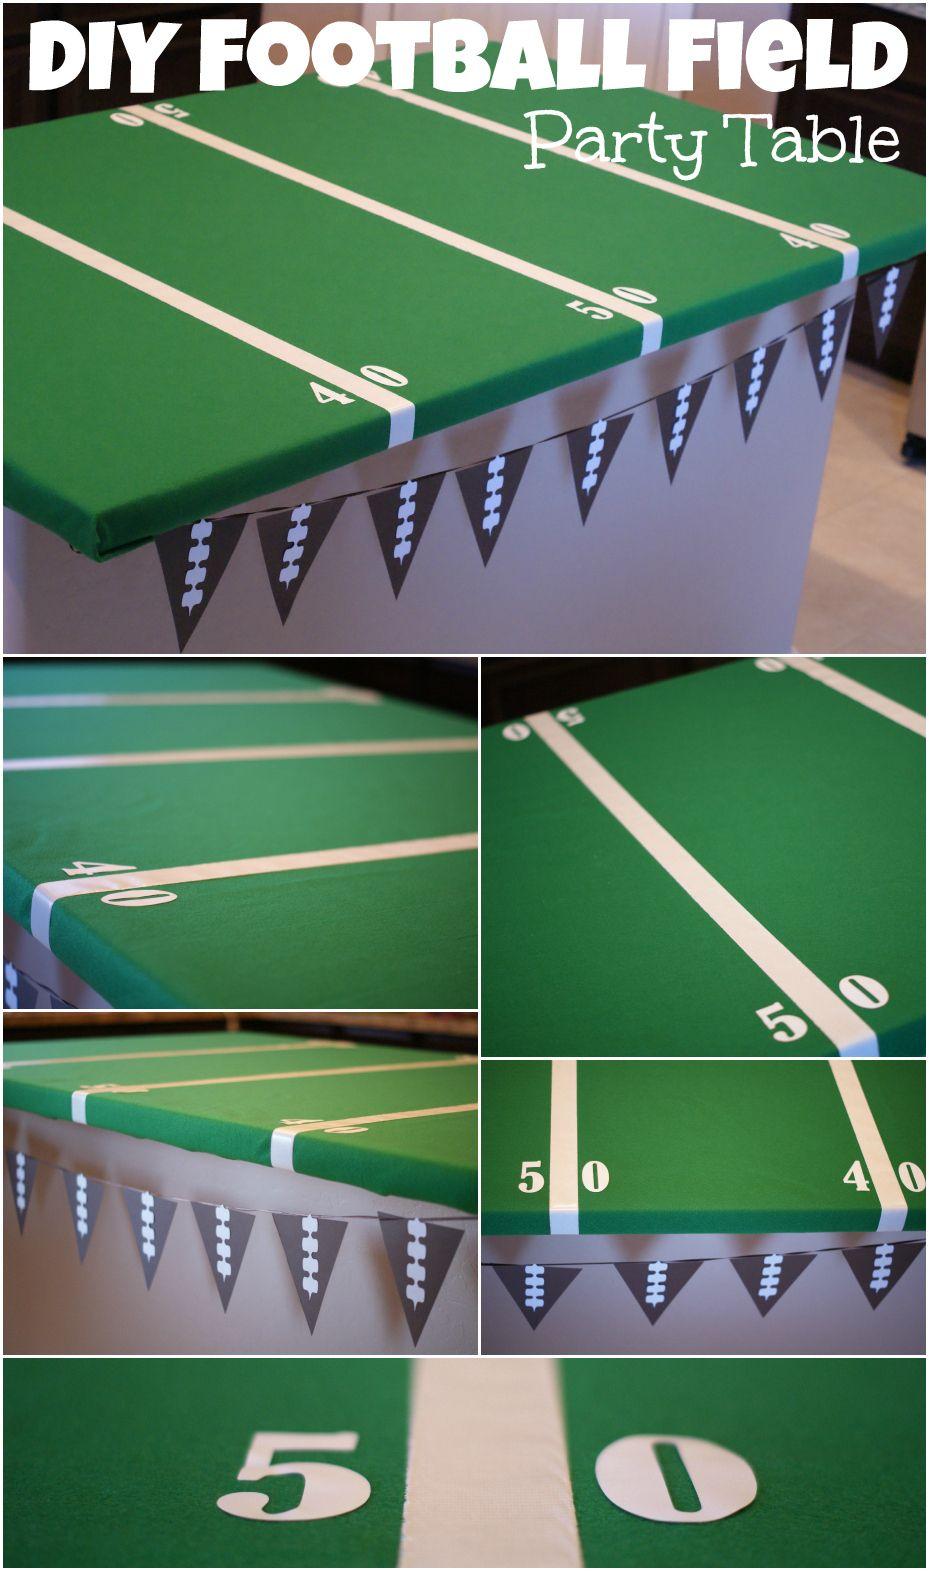 super bowl office party ideas. easy diy football field party table anightowlblogcom superbowl super bowl office ideas r